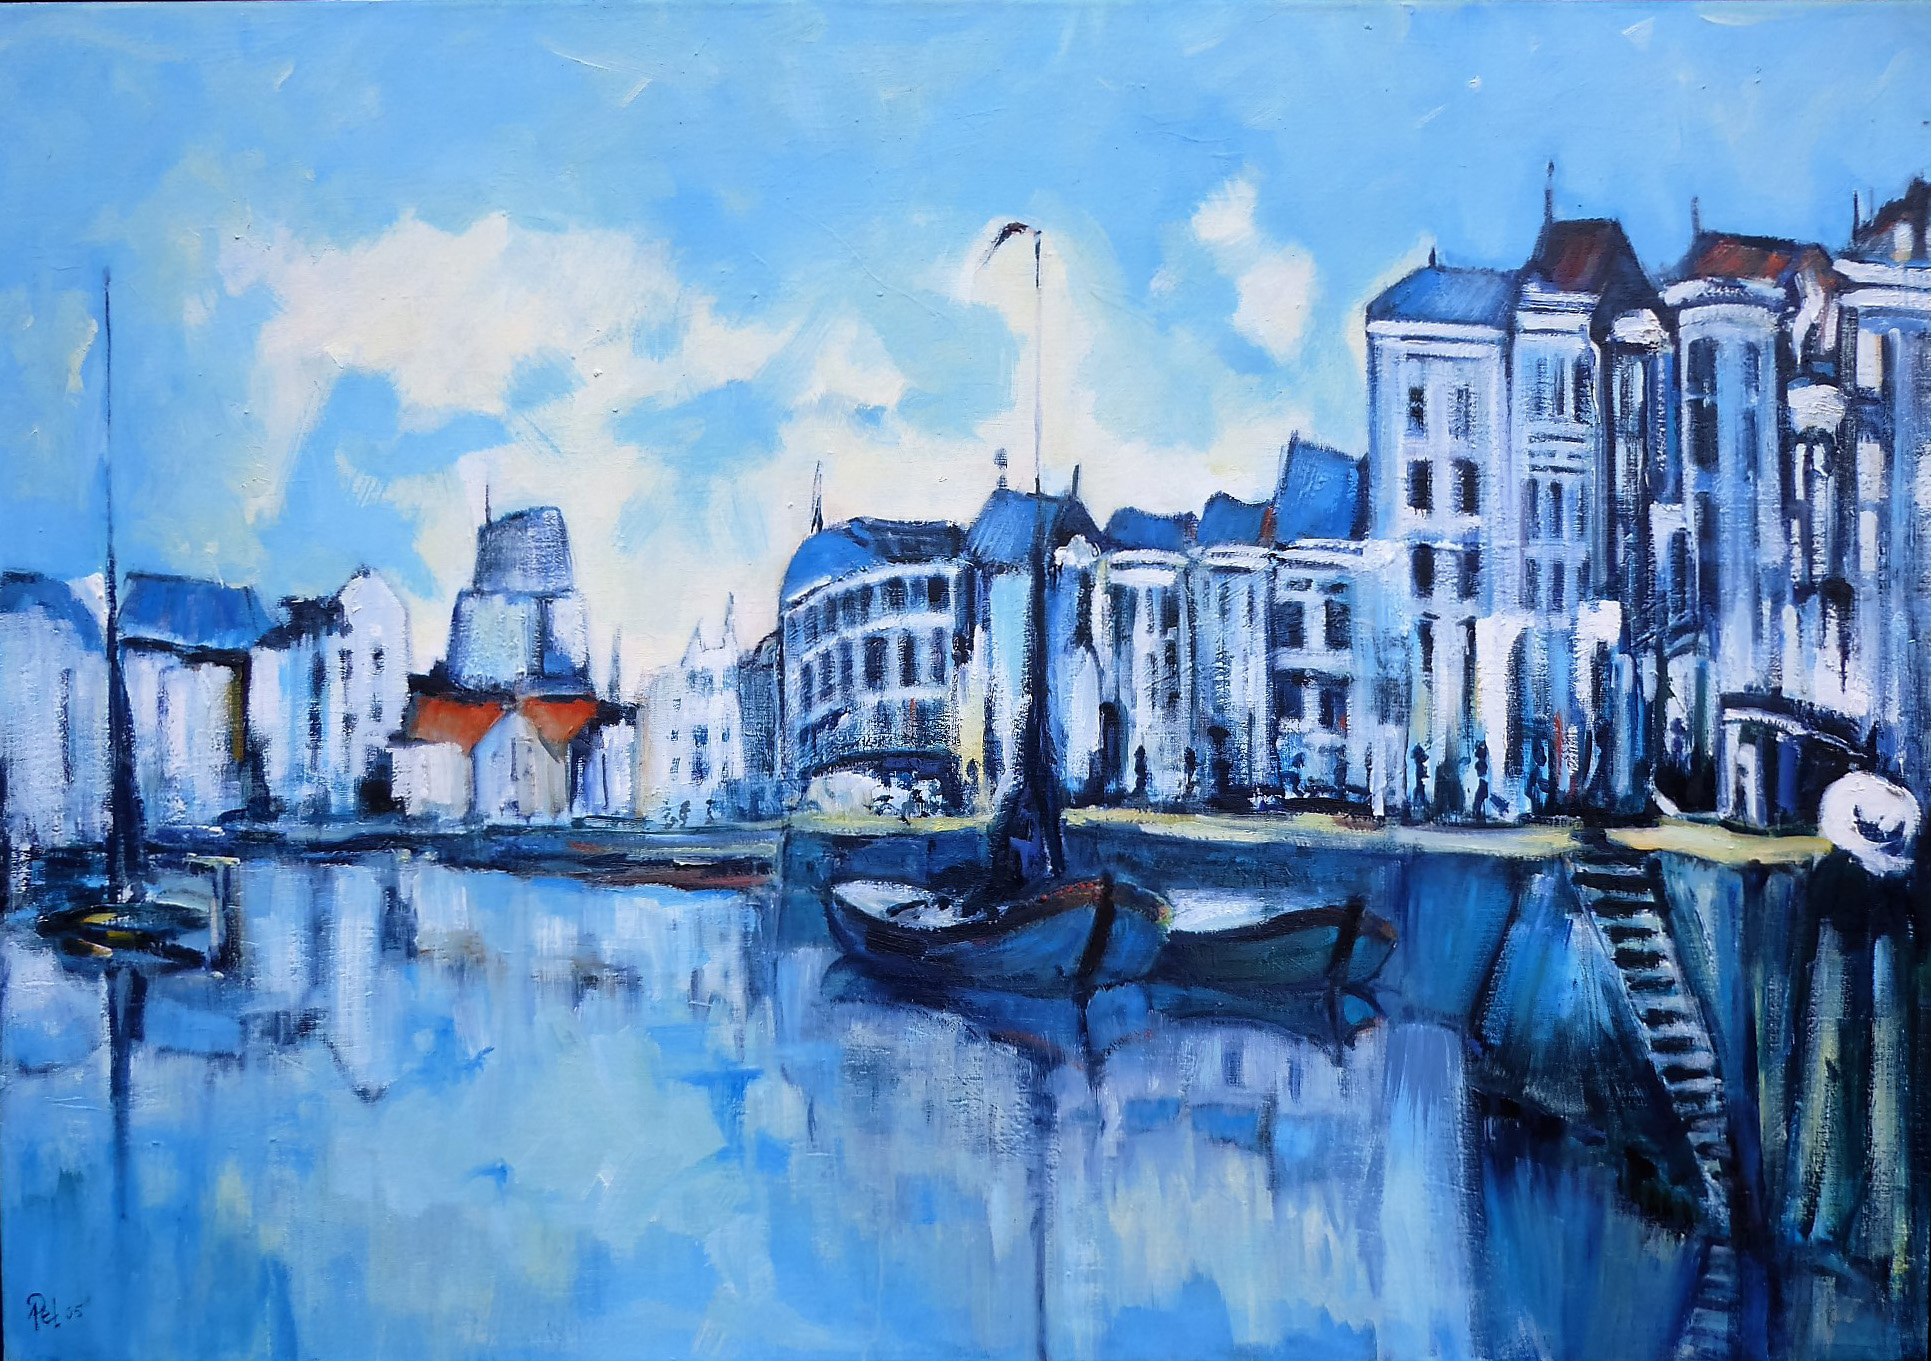 Ton Pet Blue Canal Street         Acryl op canvas     size  100 x 70 cm